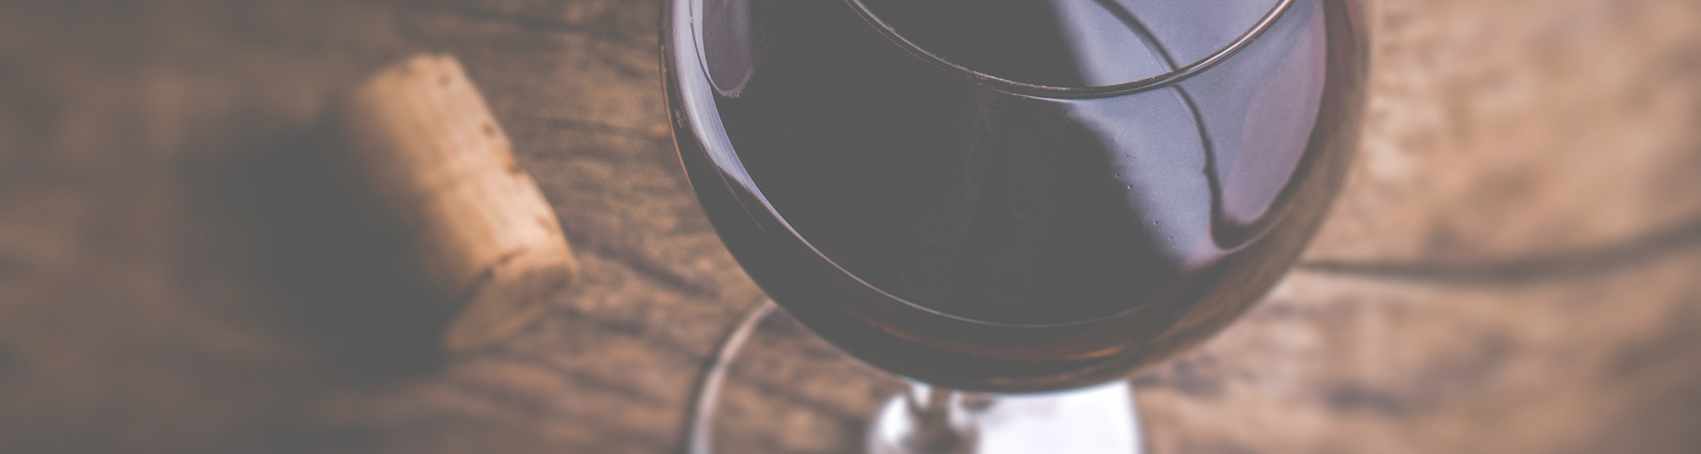 Secteur viticole et vinicole Fidaquitaine